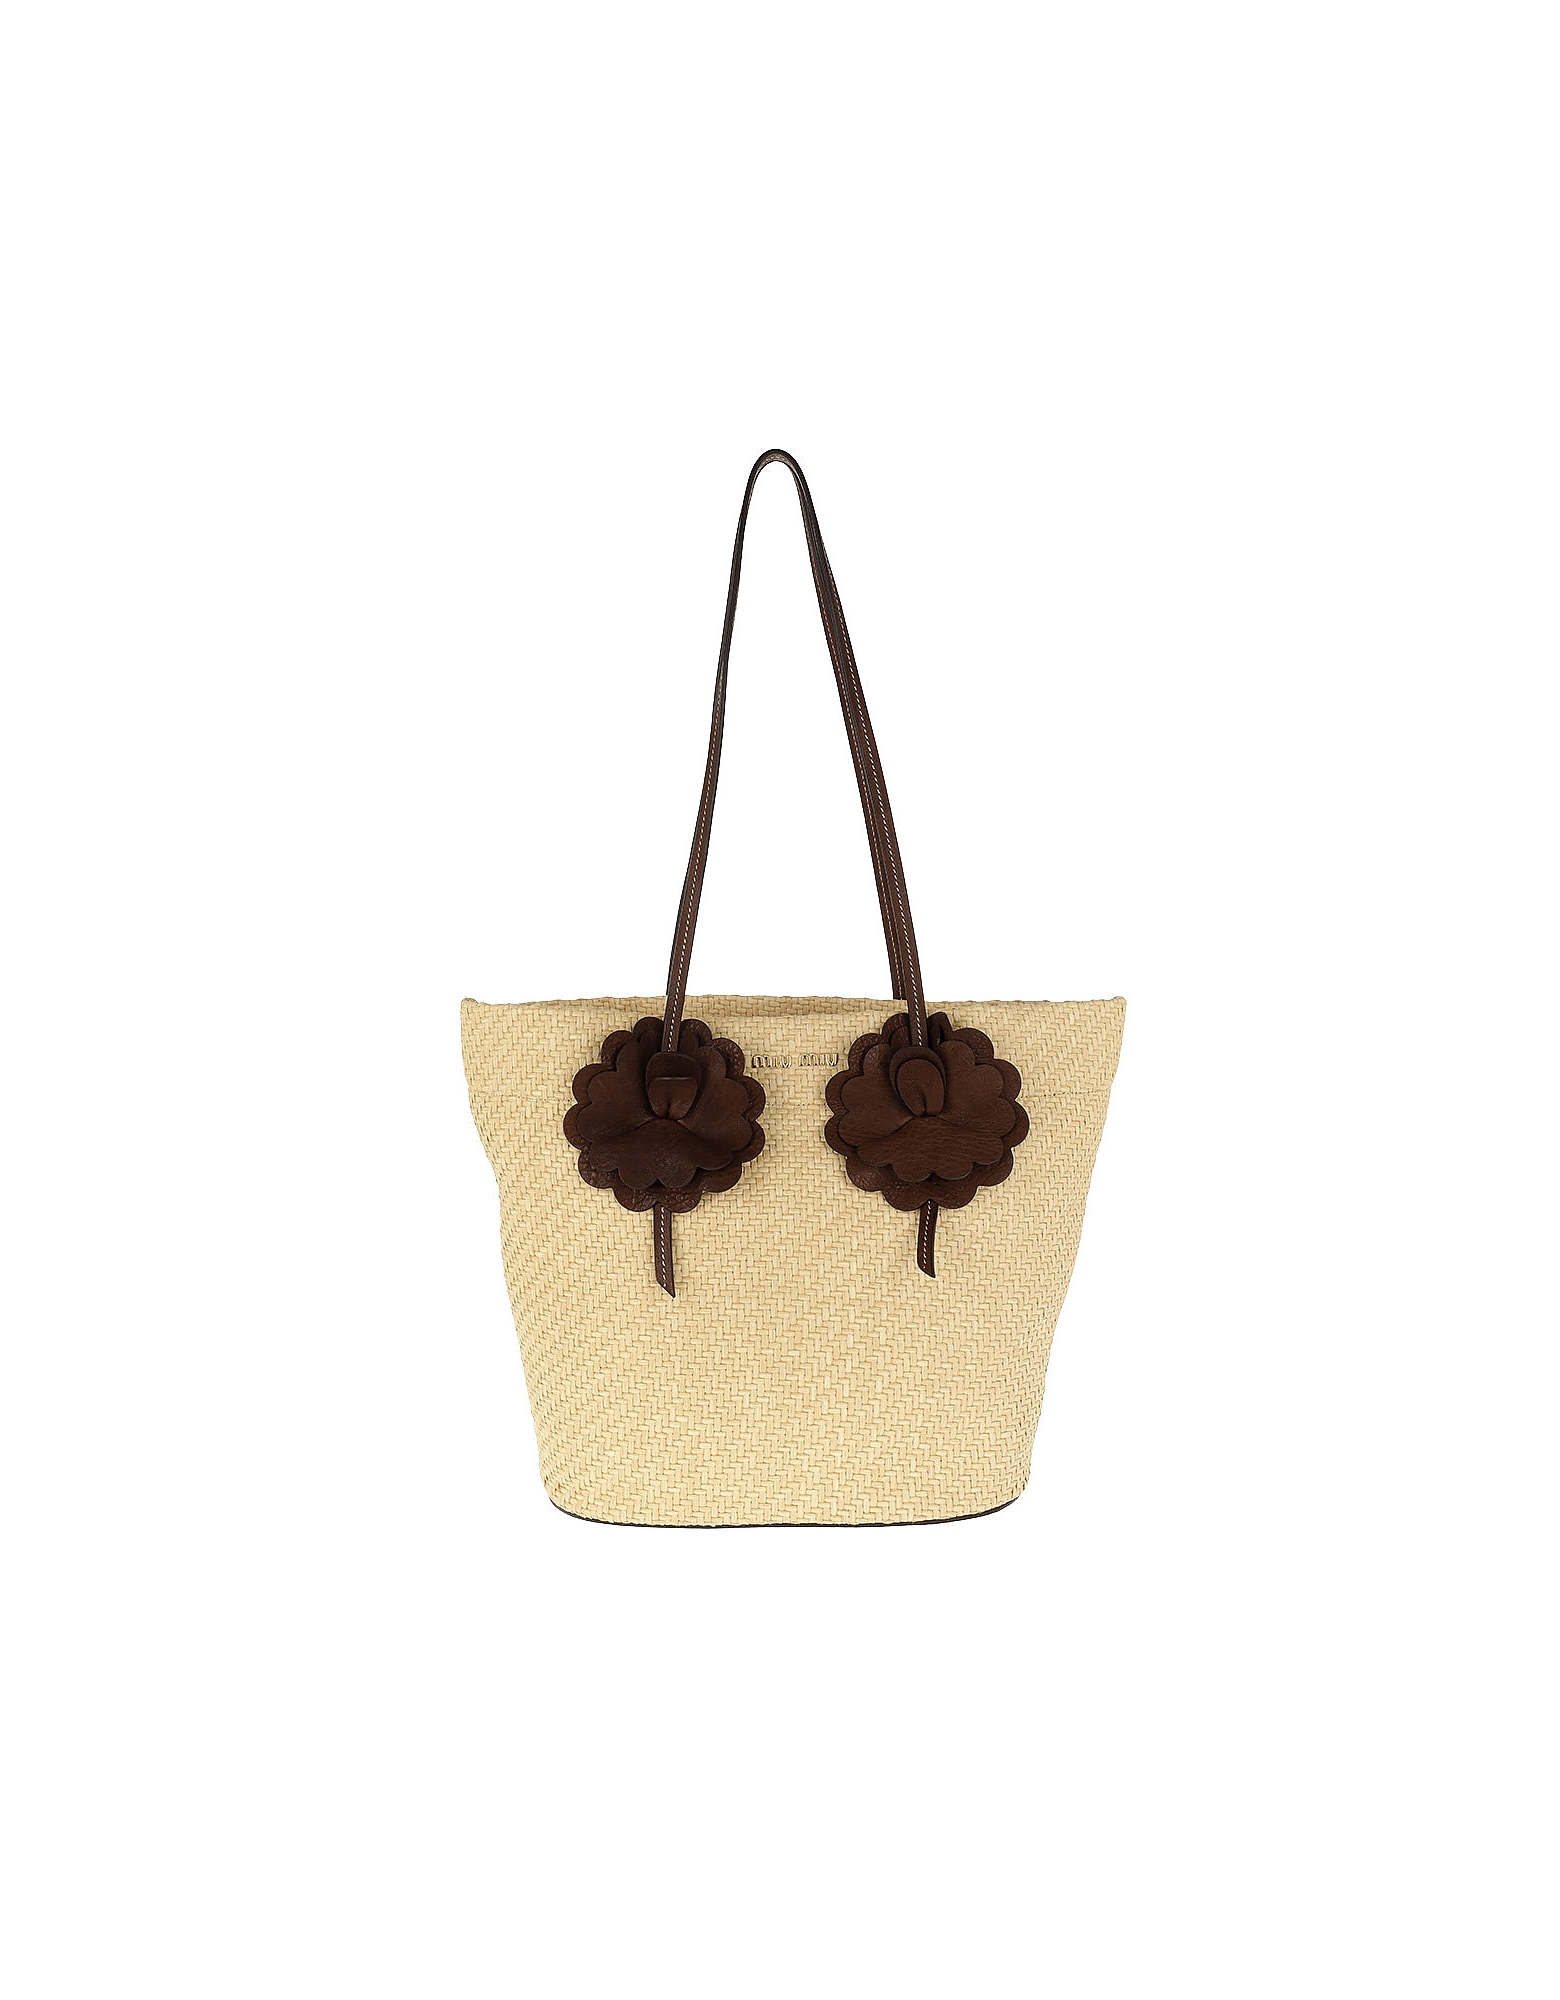 Miu Miu Handbags, Straw Shopping Bag NATURALE+BRUCIA